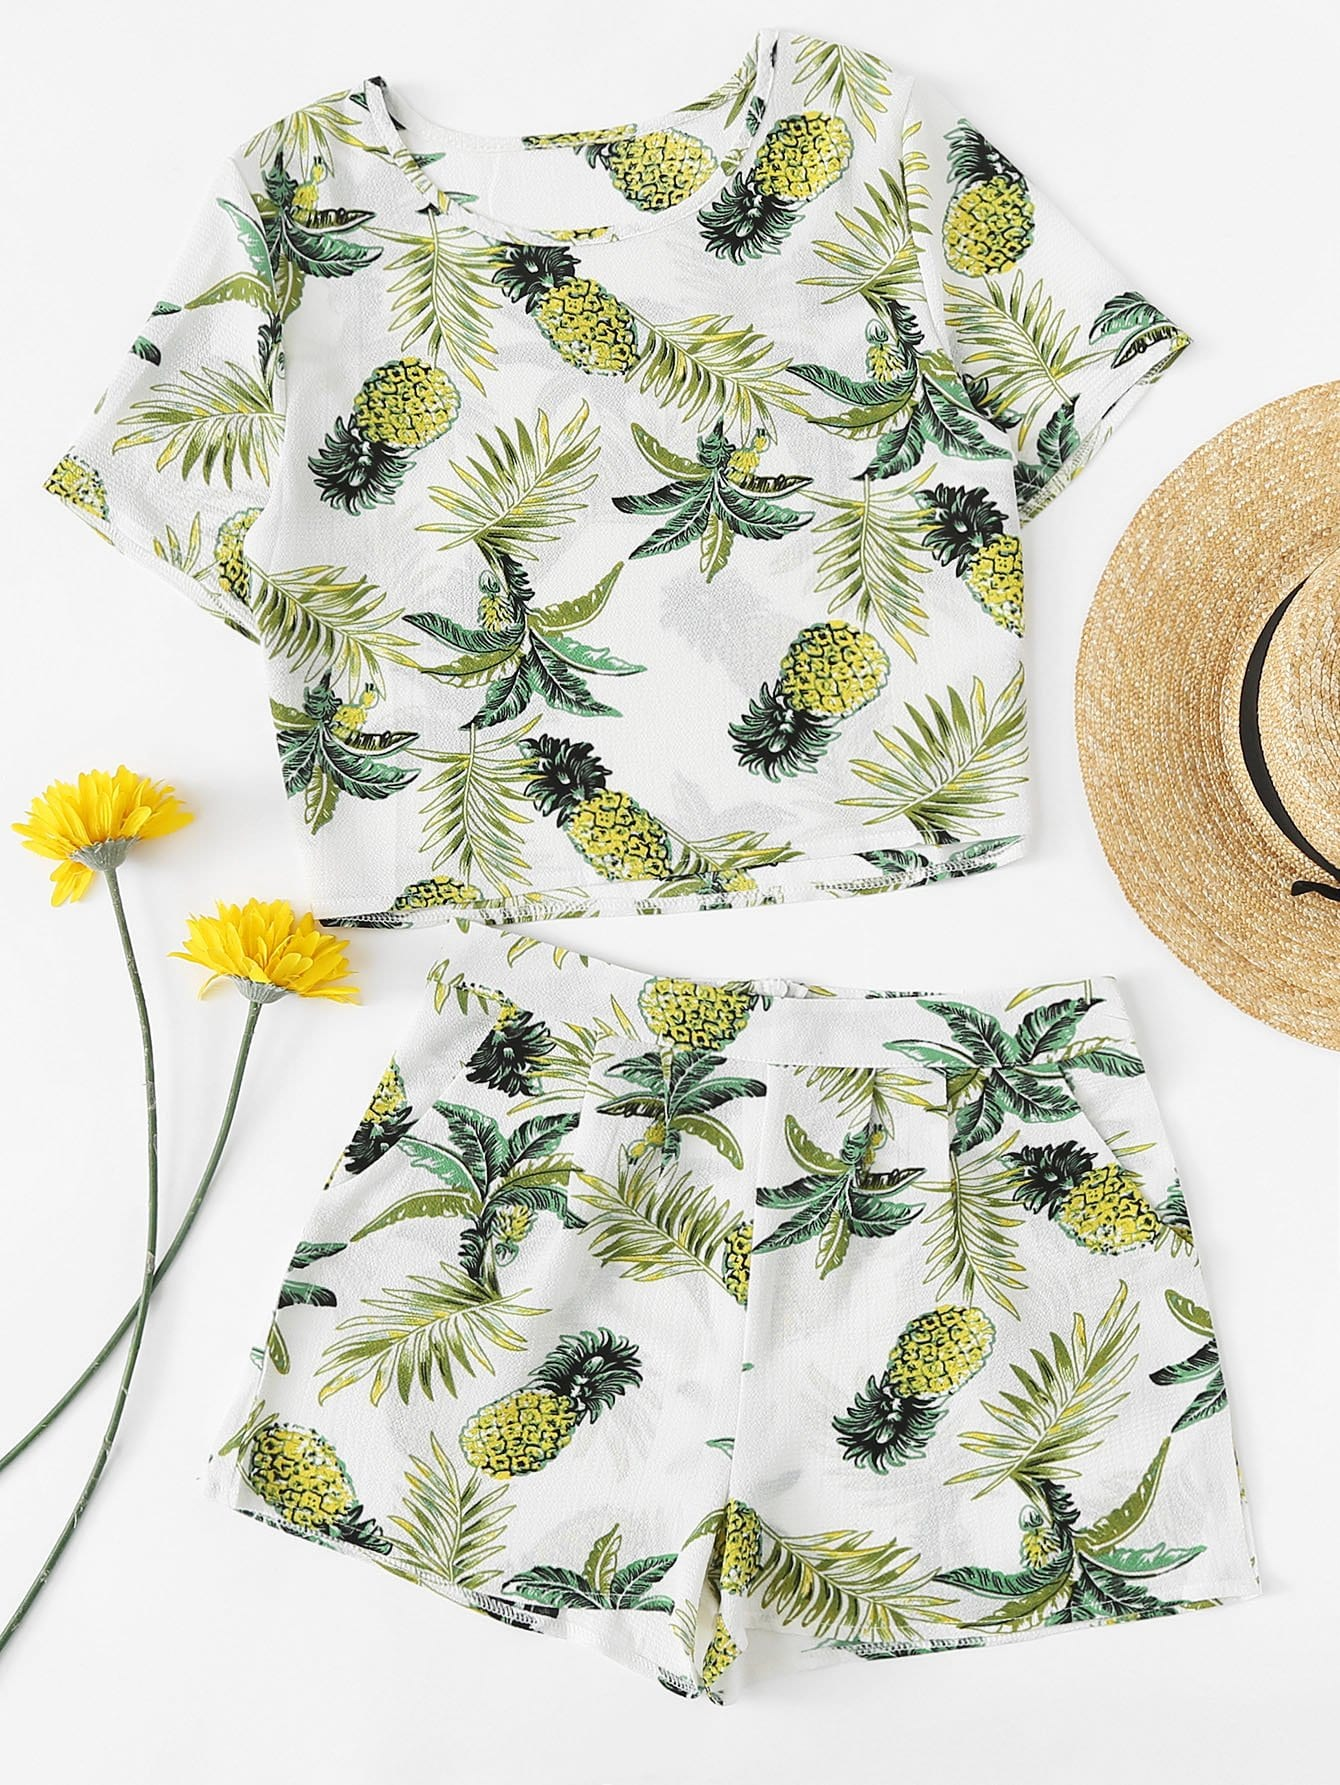 Pineapple Print Crop Top With Shorts black choker sleeveless crop top